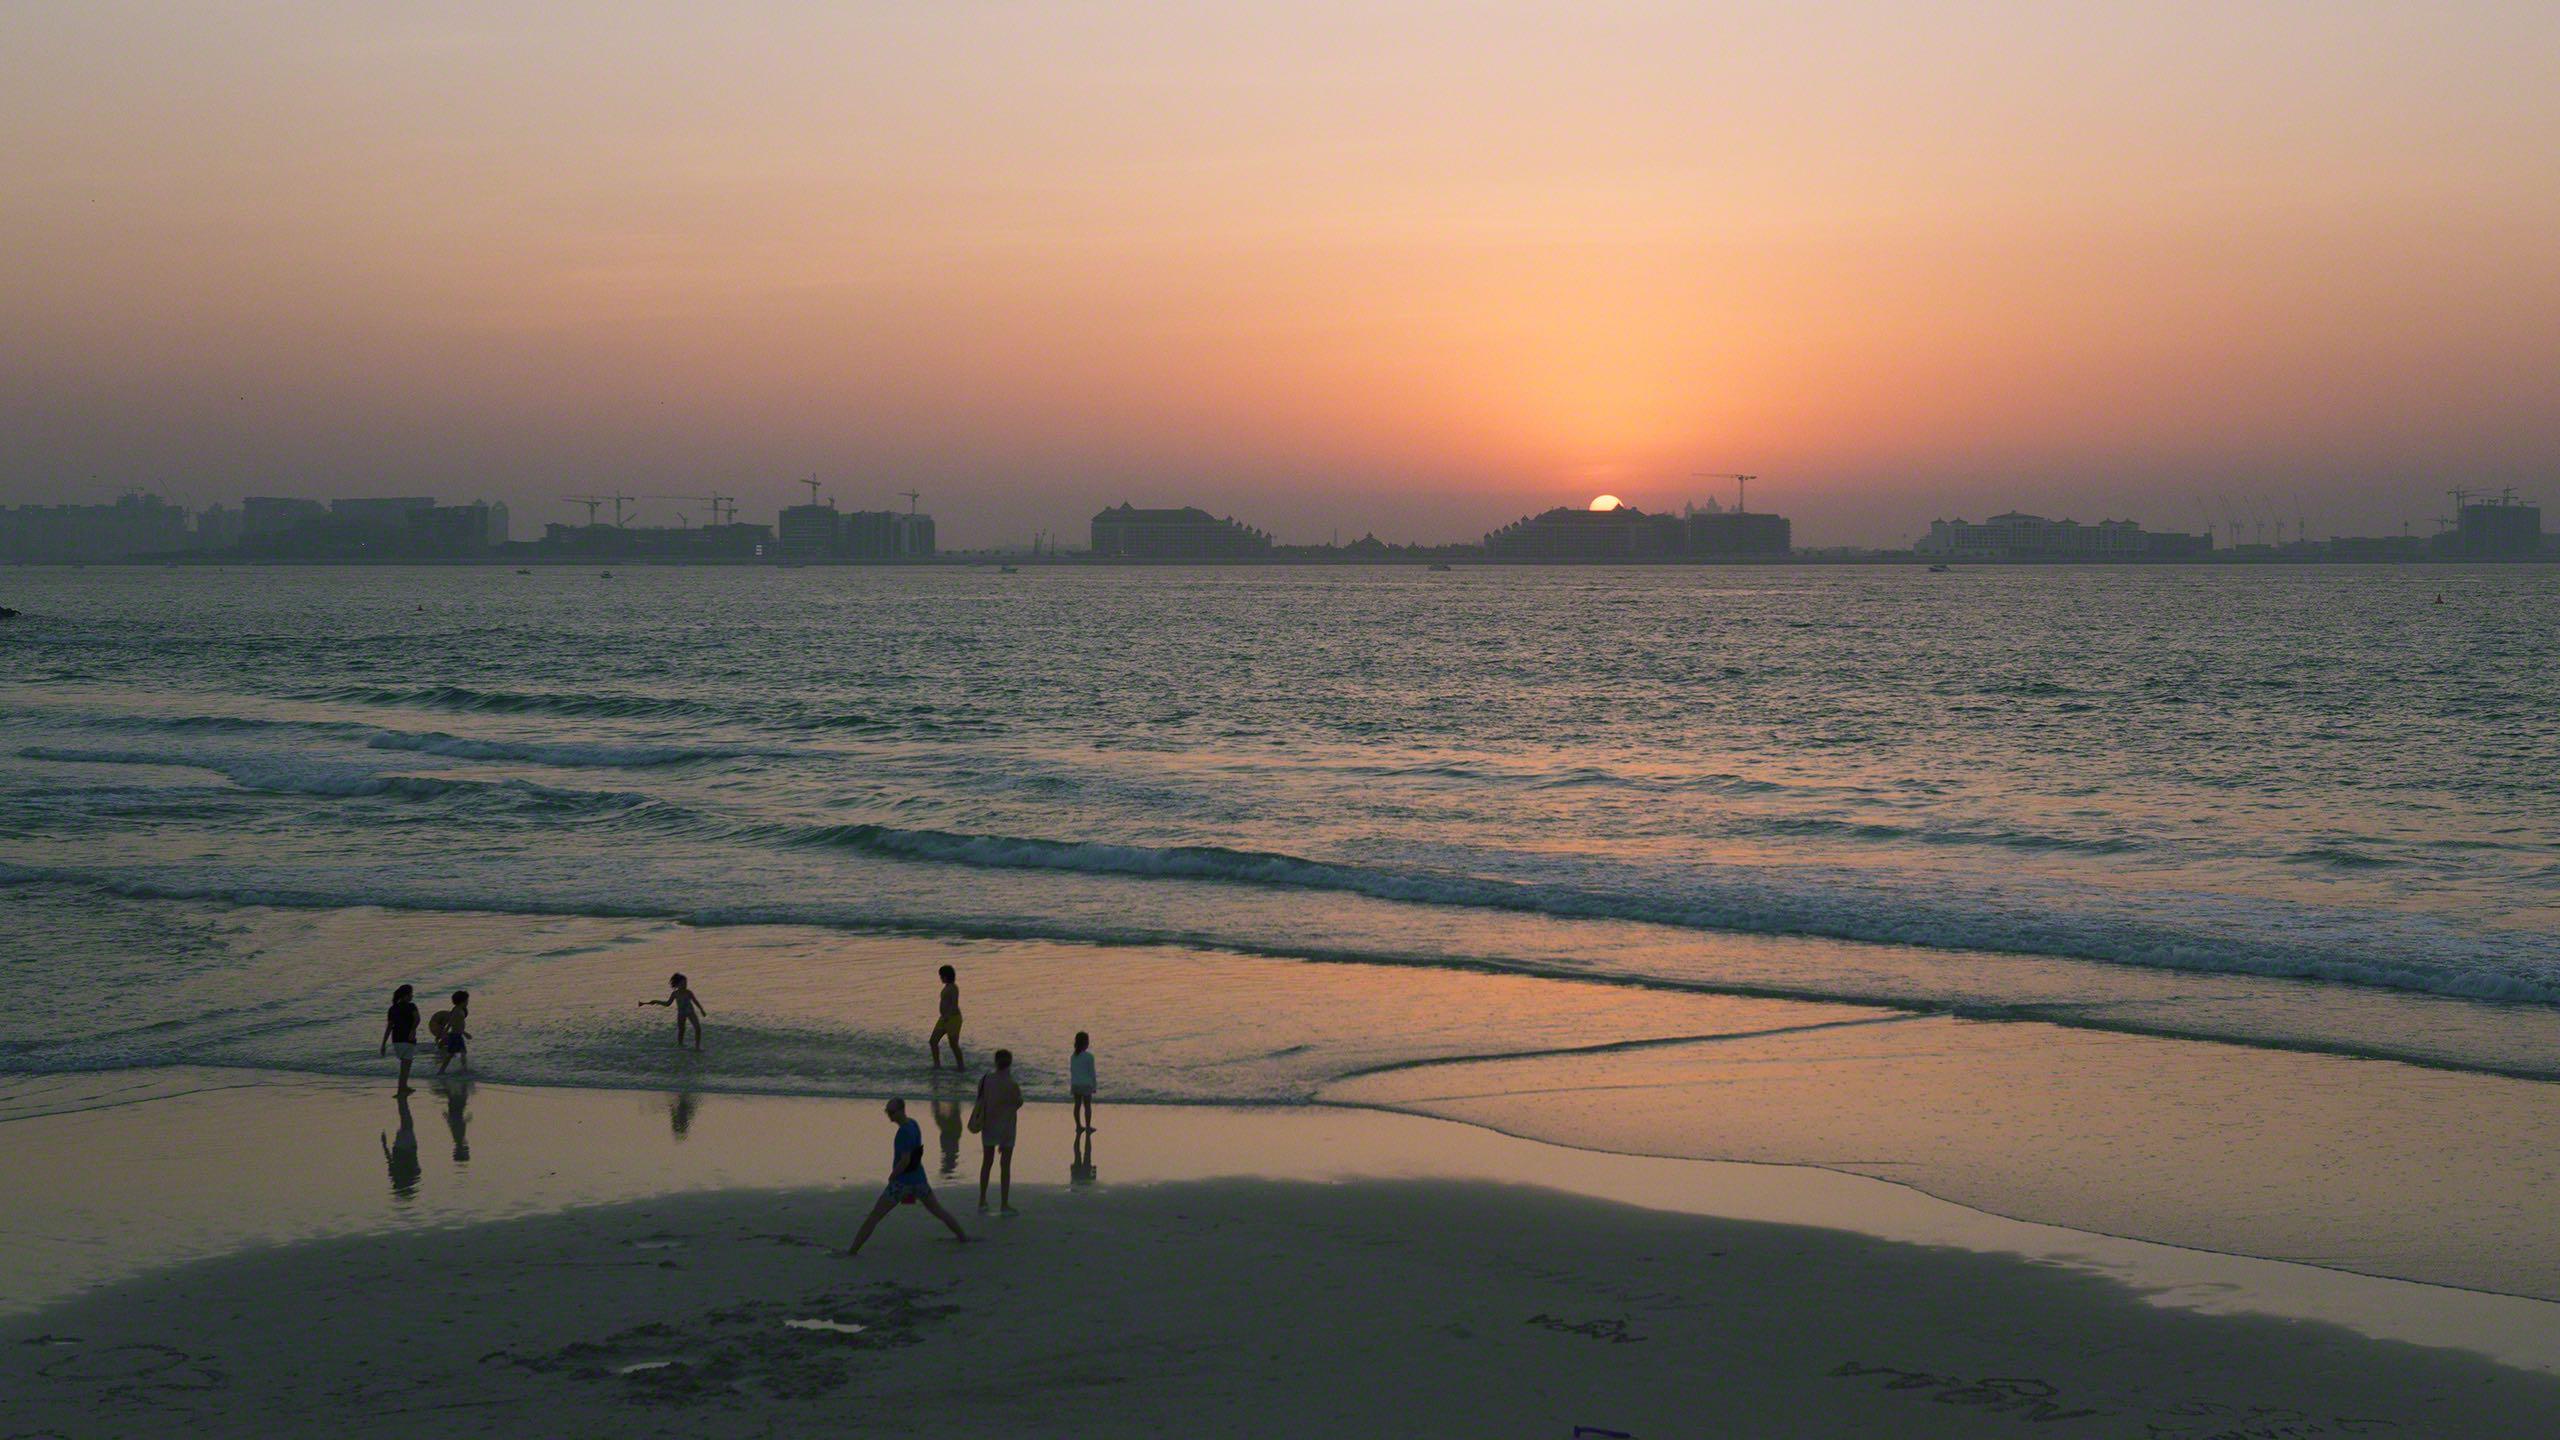 Romantische Stimmung am Beach des Madinat Jumeirah Resorts